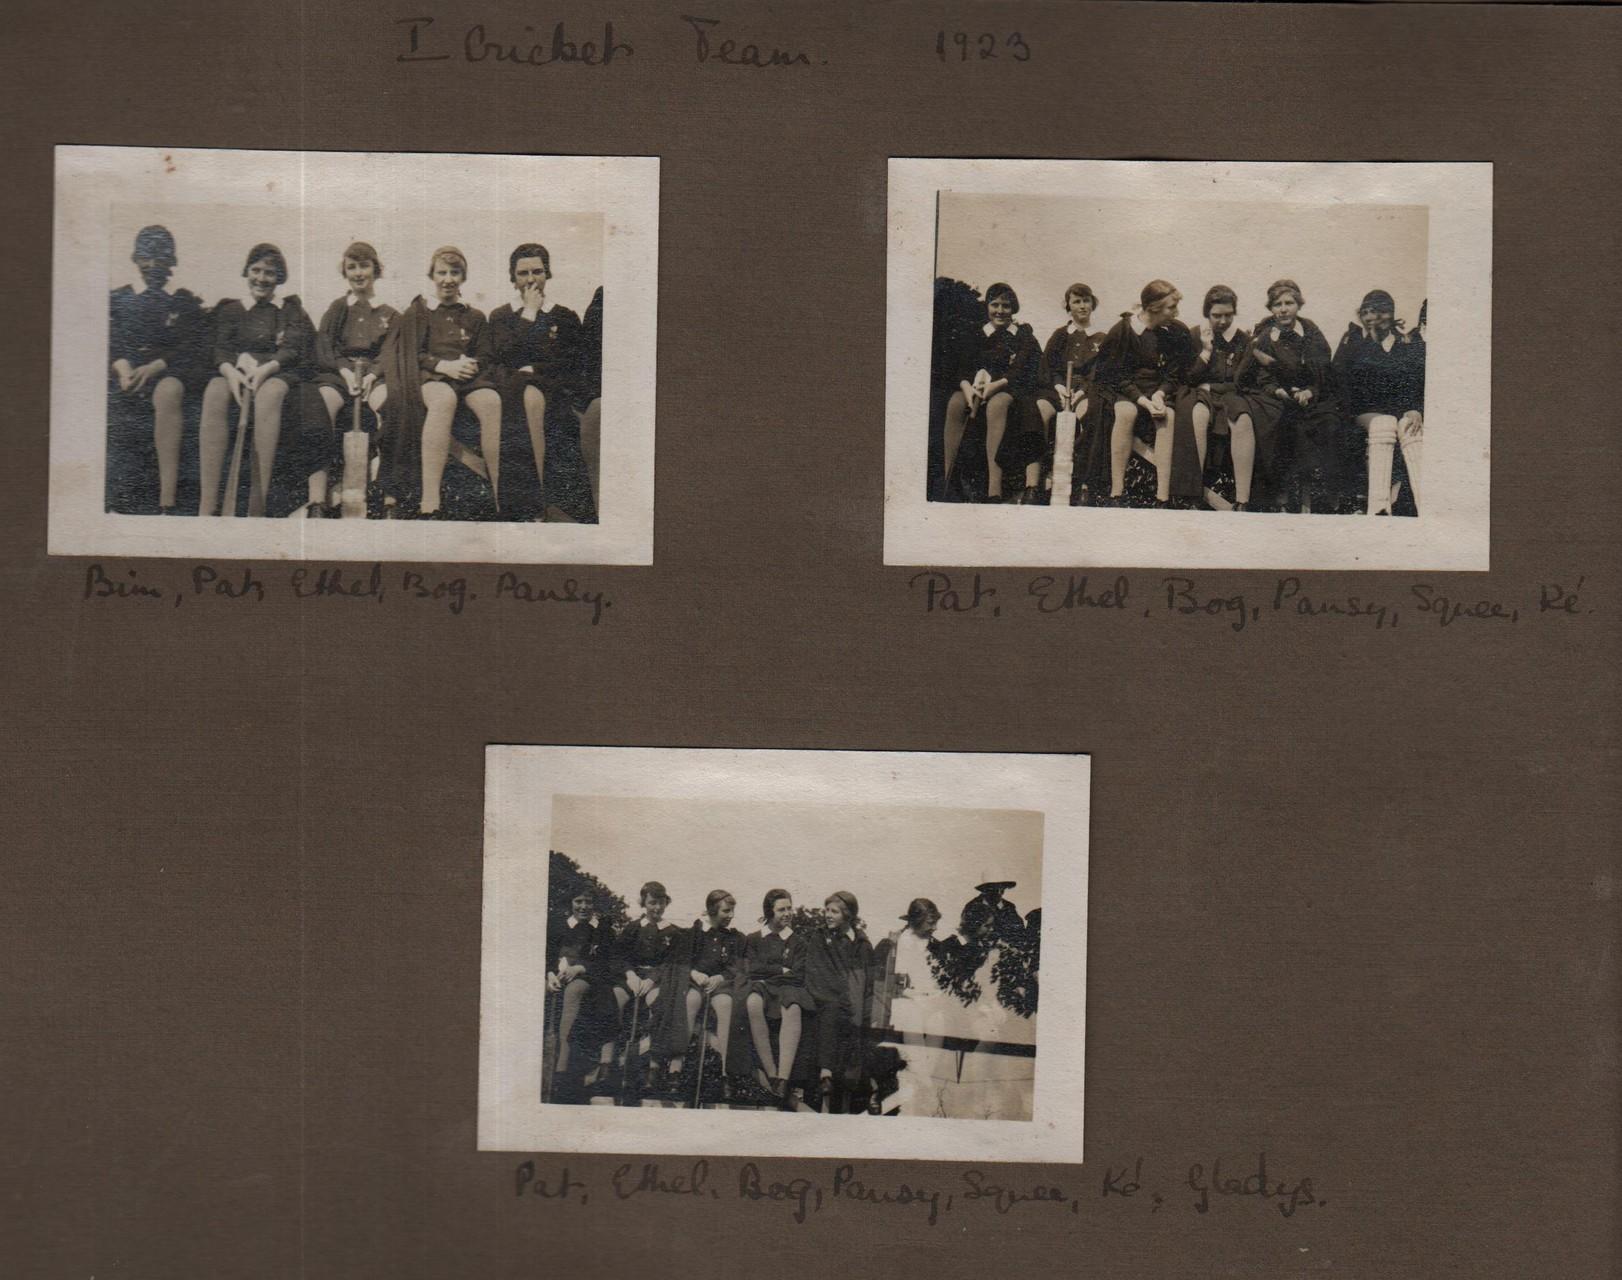 1st Cricket Team 1923: Bim. Pat, Ethel, Bog, Pansy; Pat, Ethel, Bog, Pansy, Squee, Ke; Pat, Ethel, Bog, Pansy, Squee, Ke, Gladys